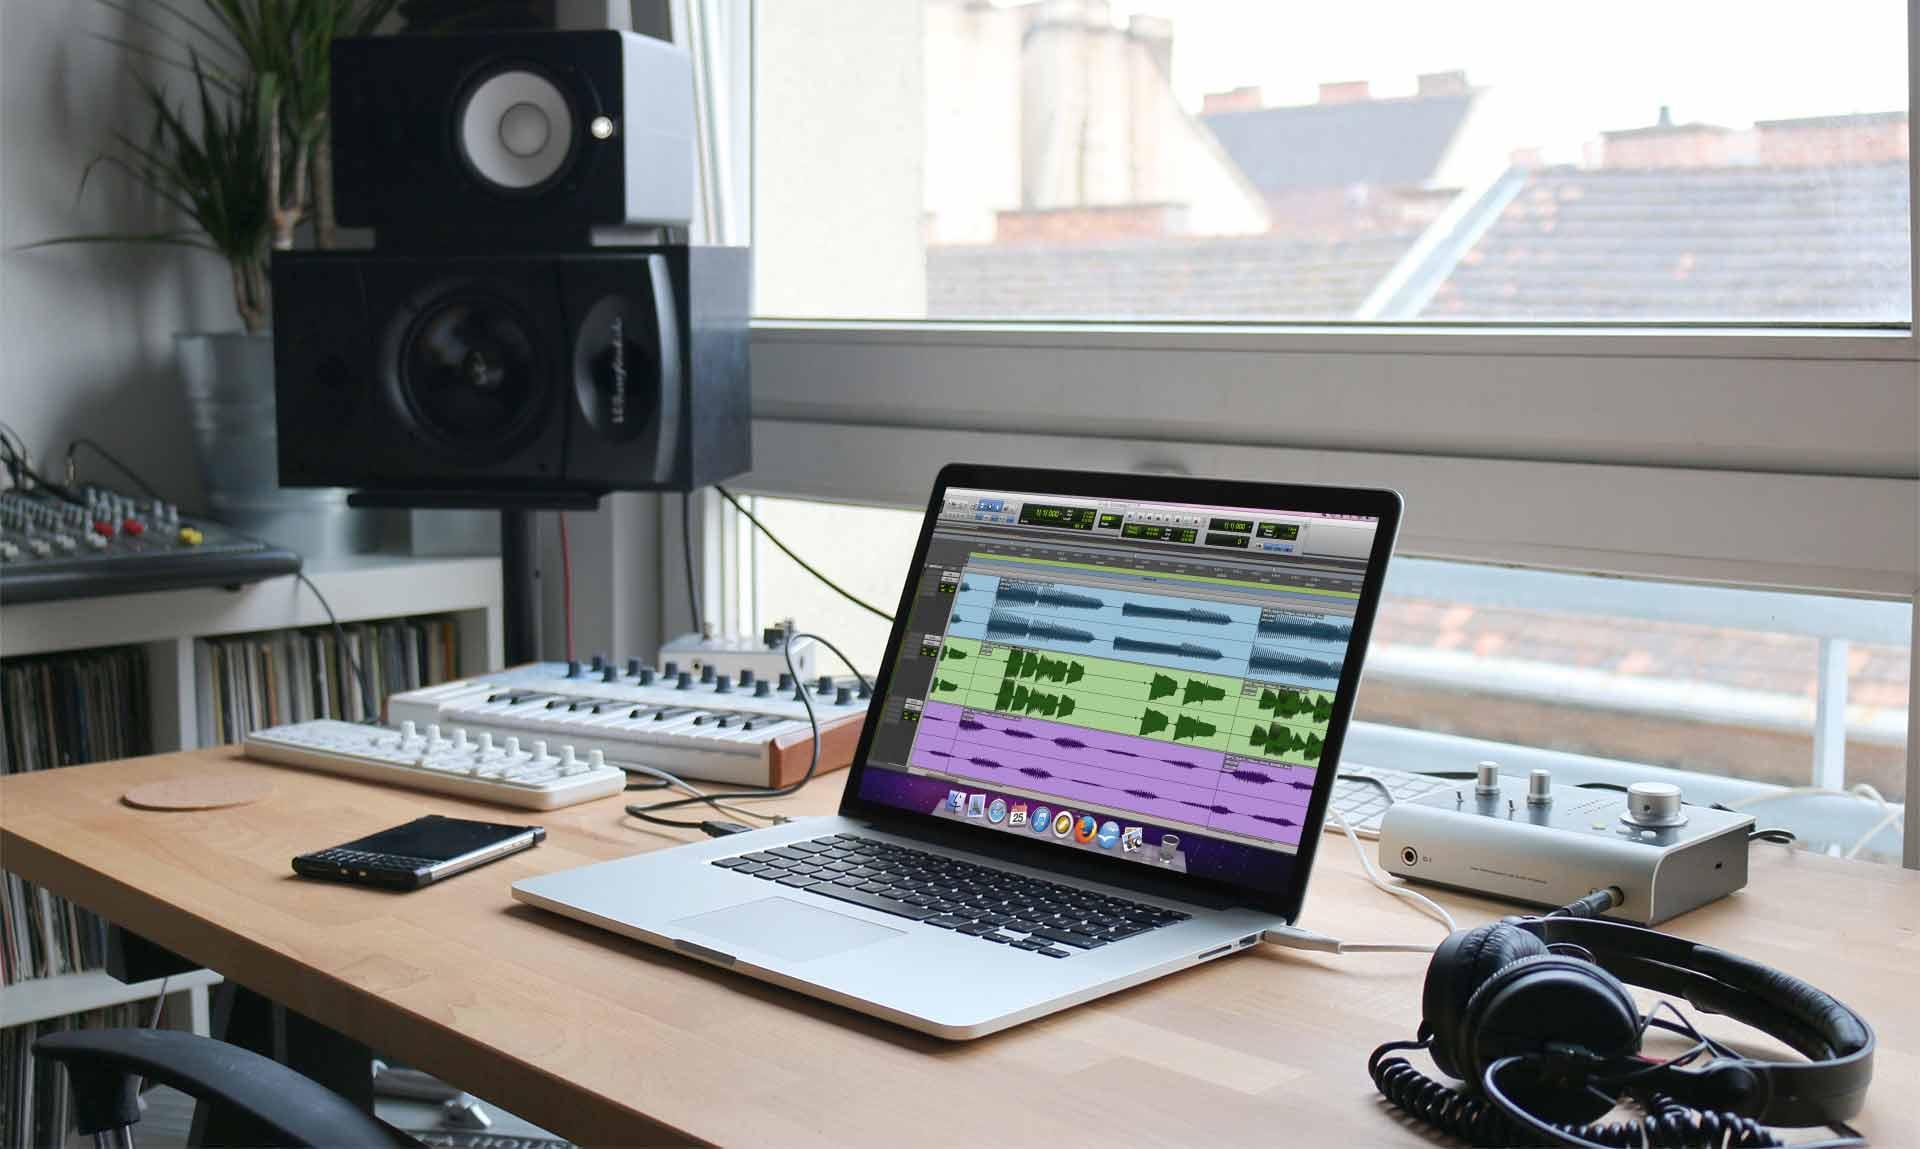 SessionBand Music Loops para ProTools, Cubase, Logic Pro, Reaper, GarageBand, Adobe Live, etc